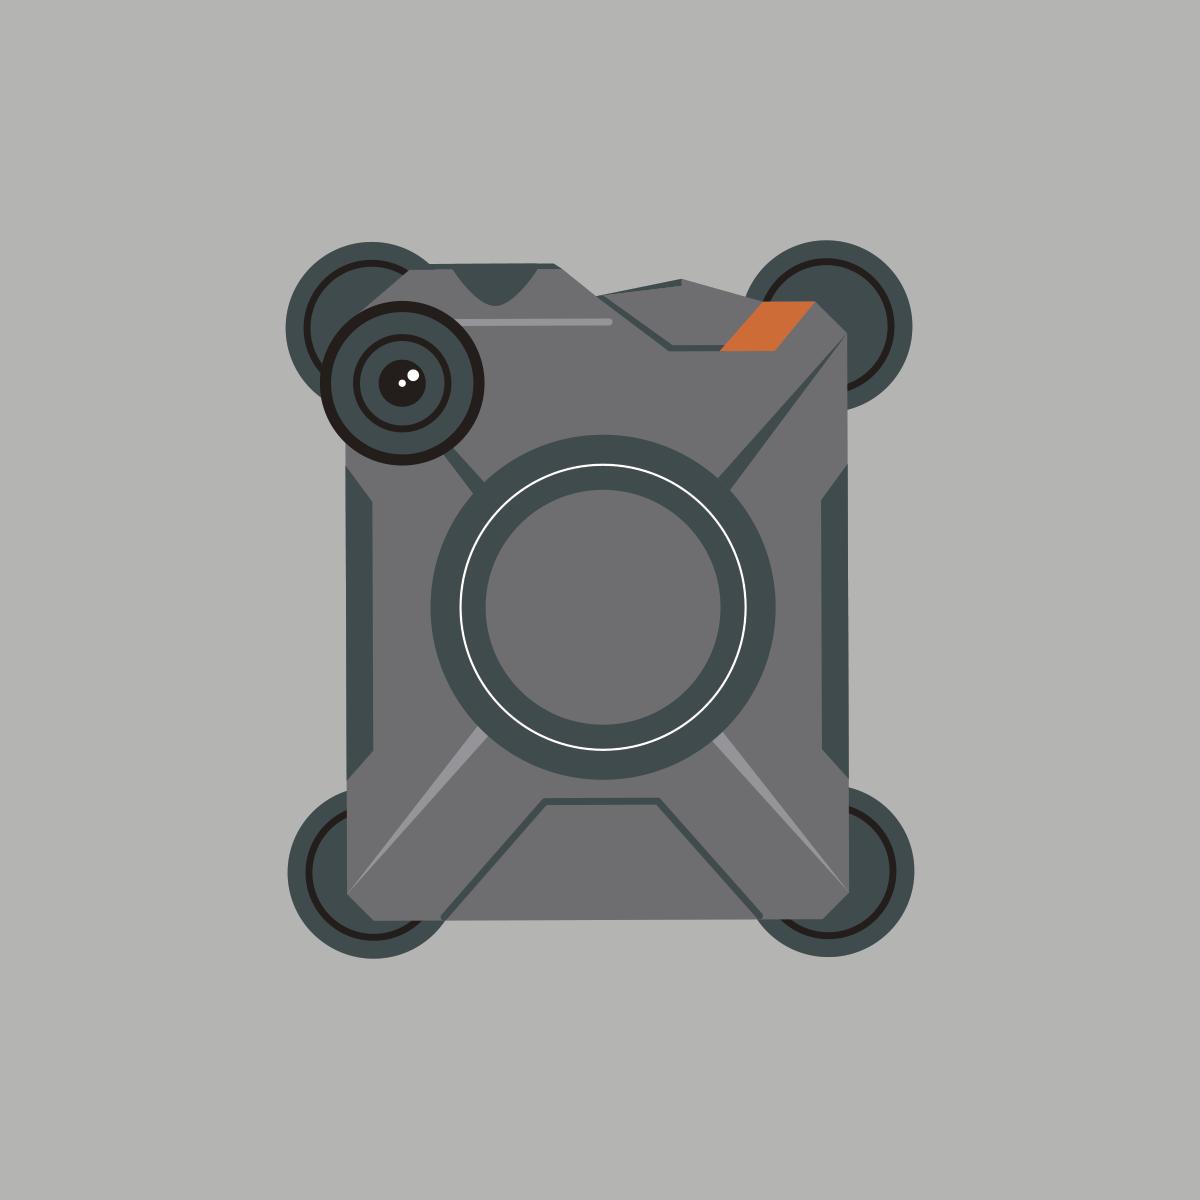 72 police body cameras